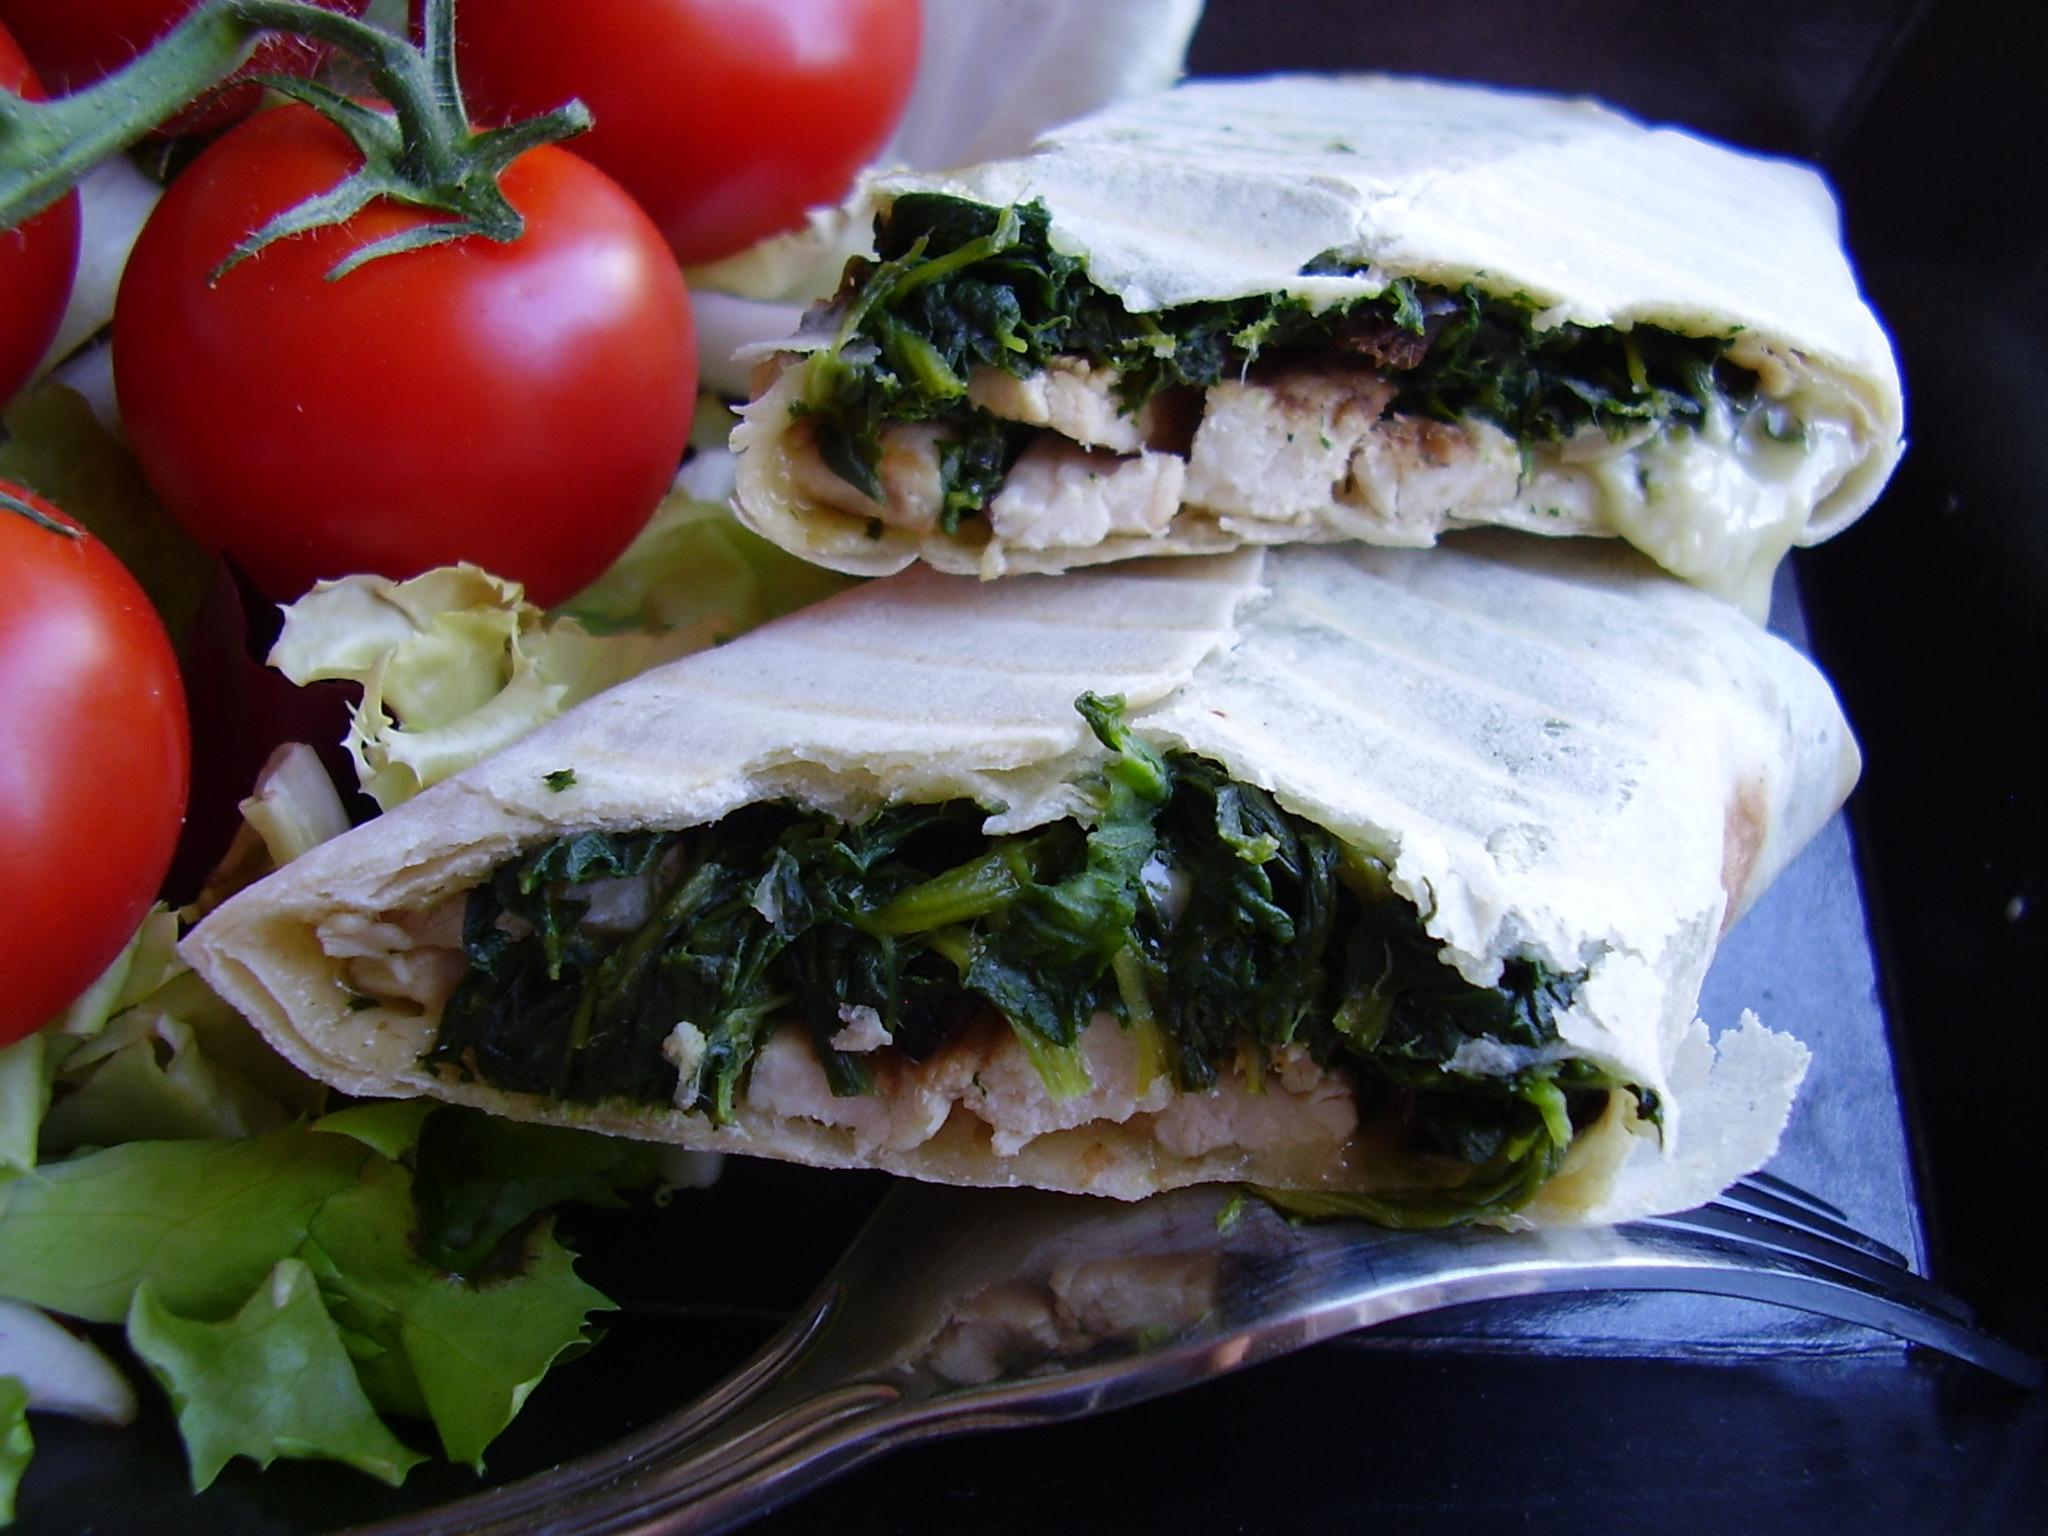 Wrap grec (poulet, feta, épinard) servi chaud